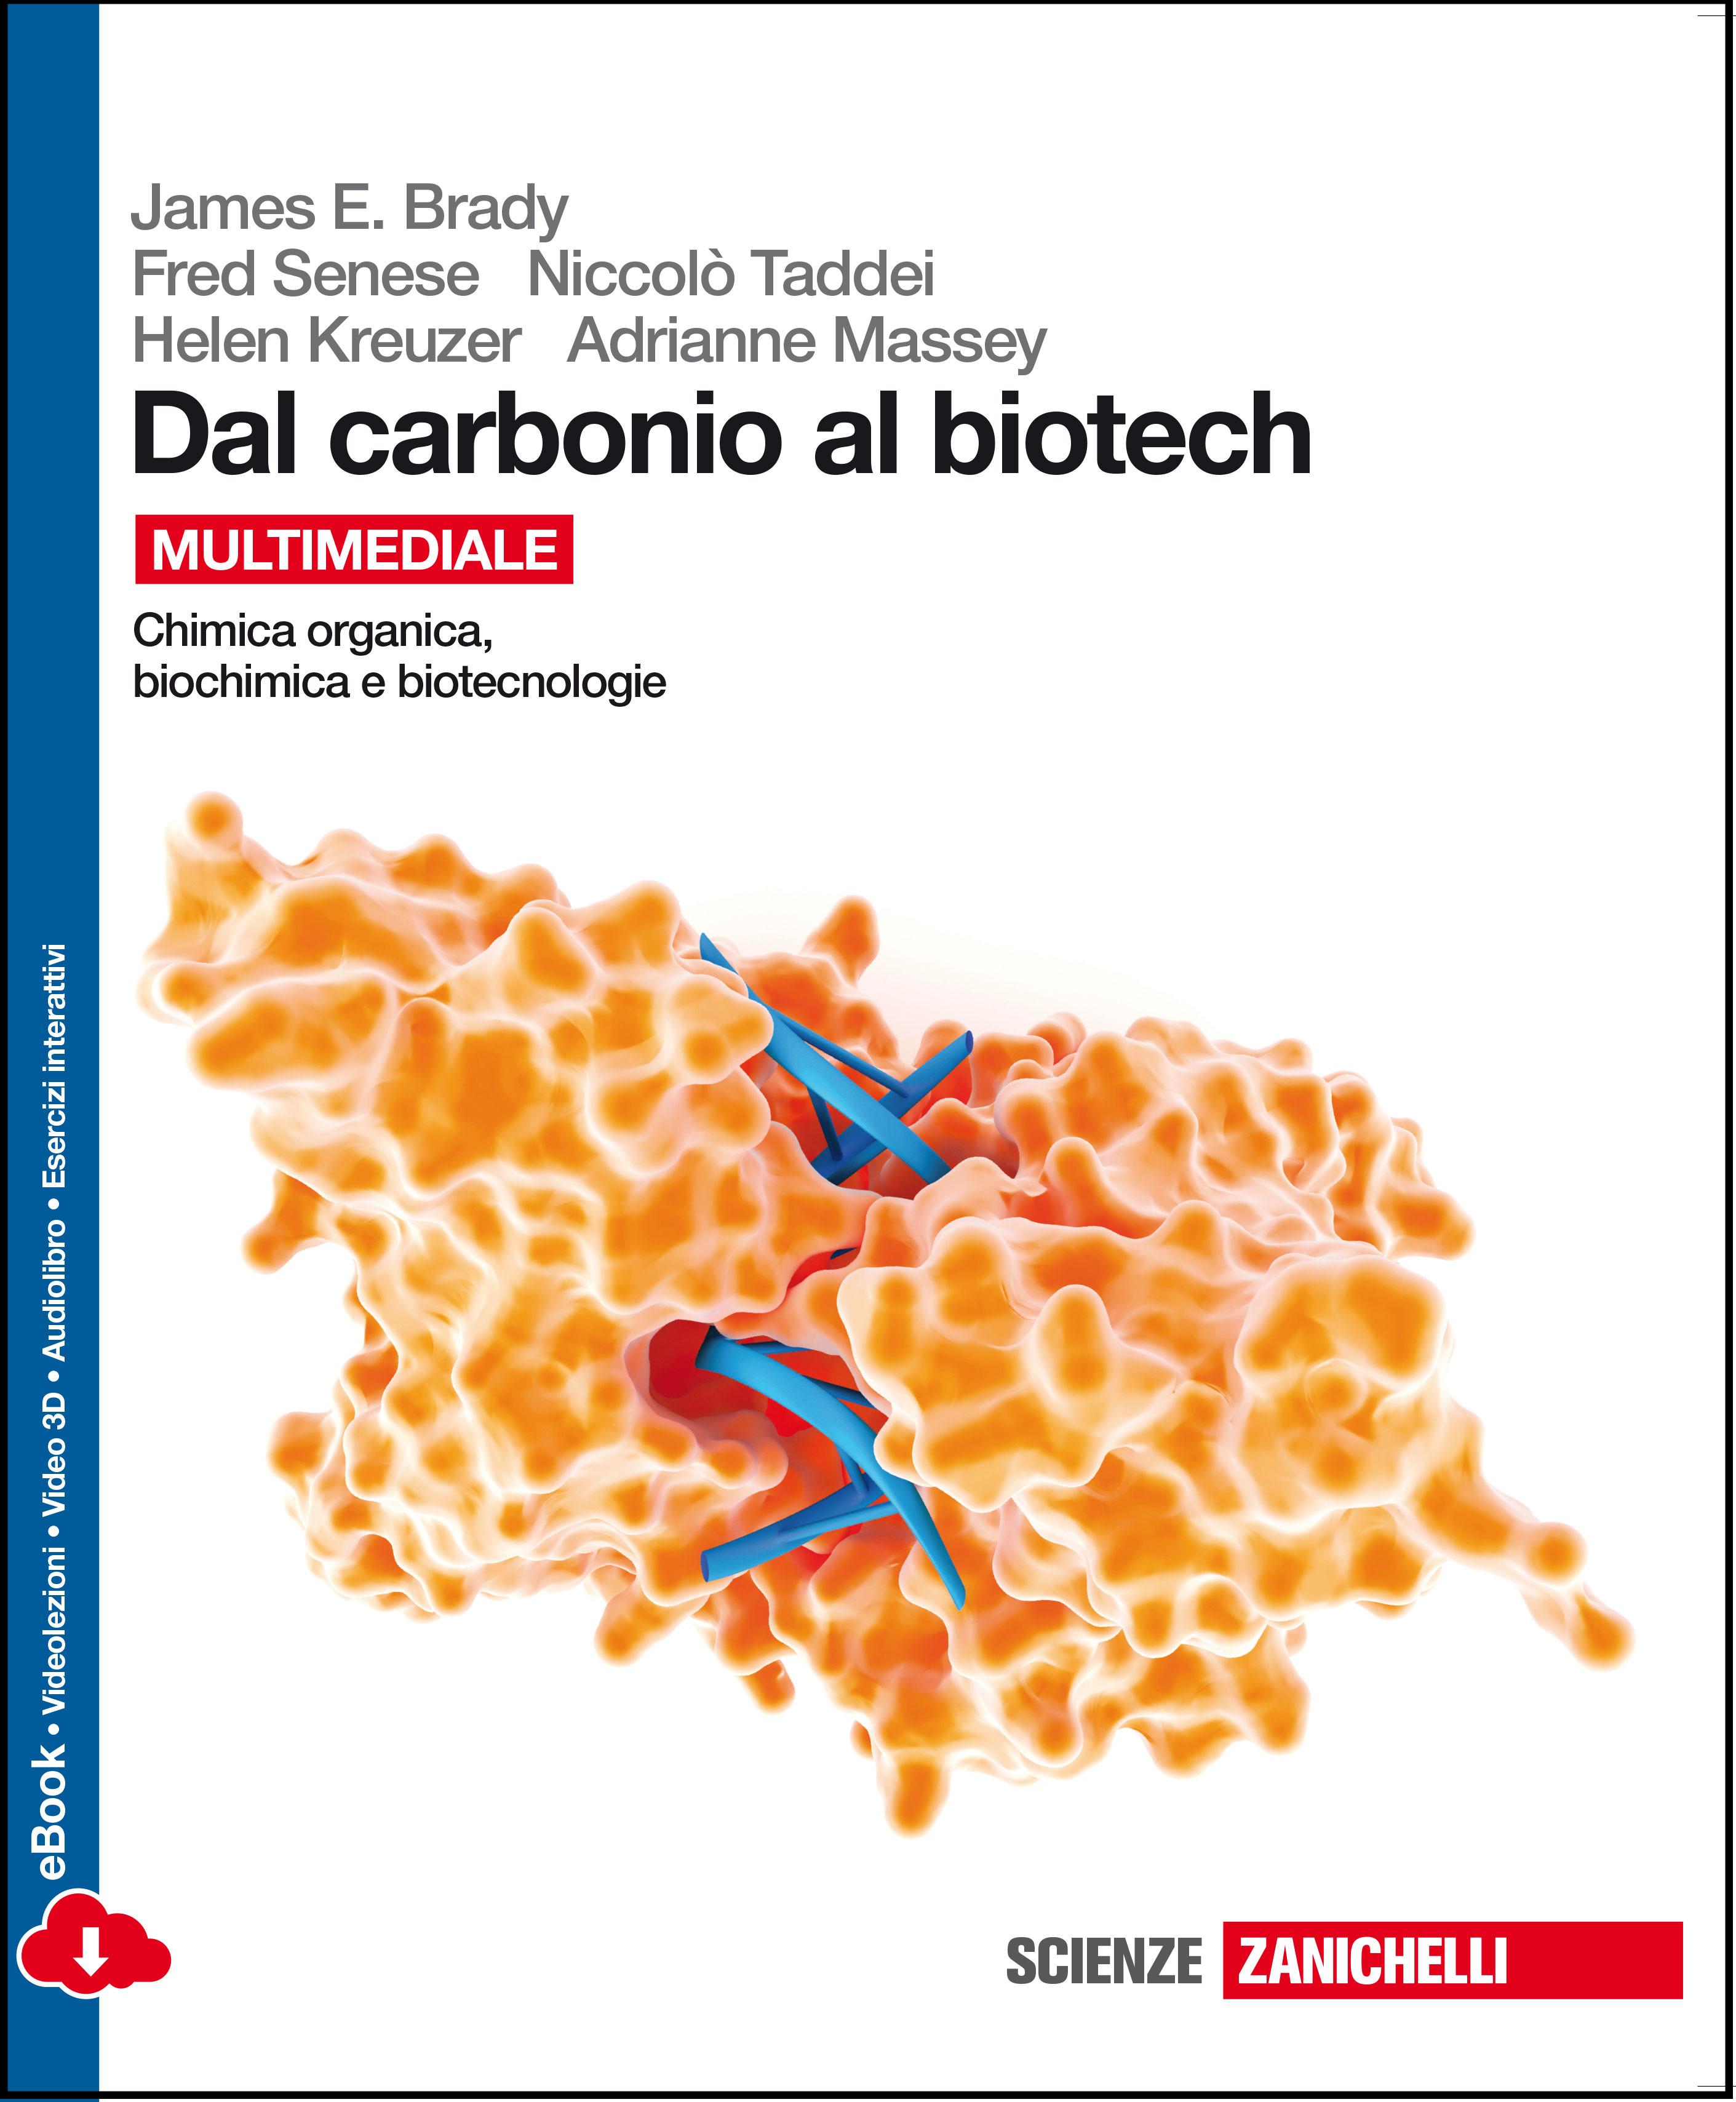 Dal carbonio al biotech